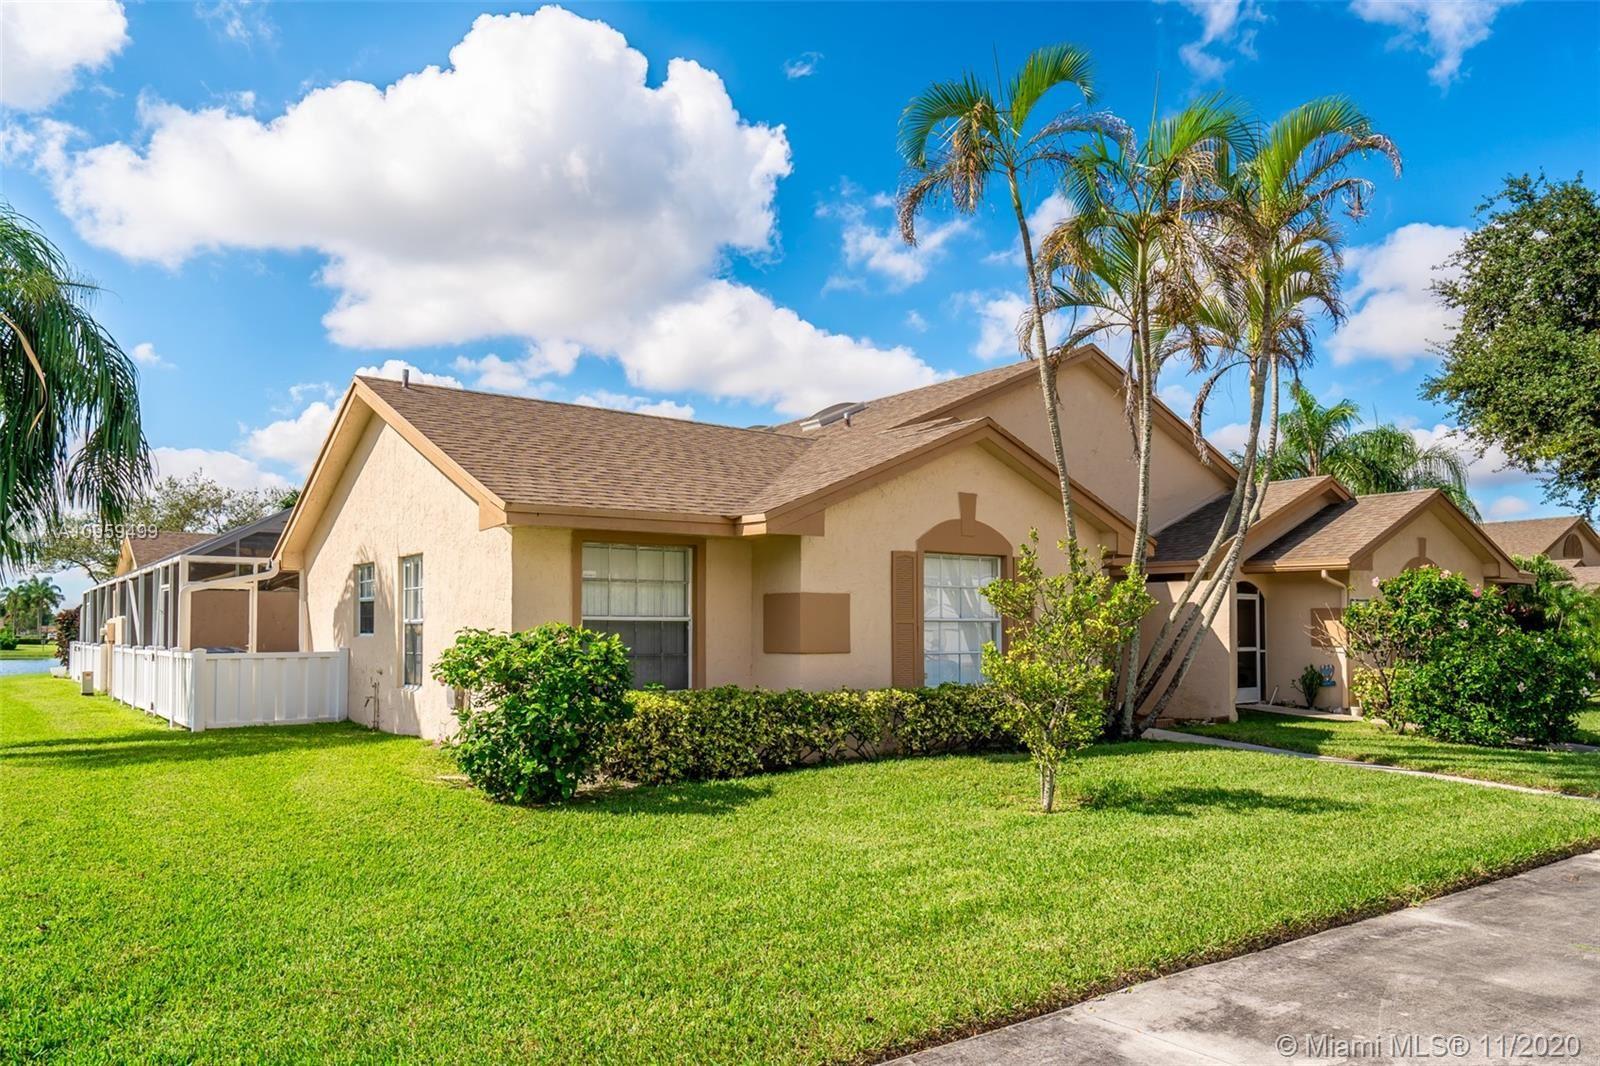 9334 Boca Gardens Pkwy #C, Boca Raton, FL 33496 - #: A10959499